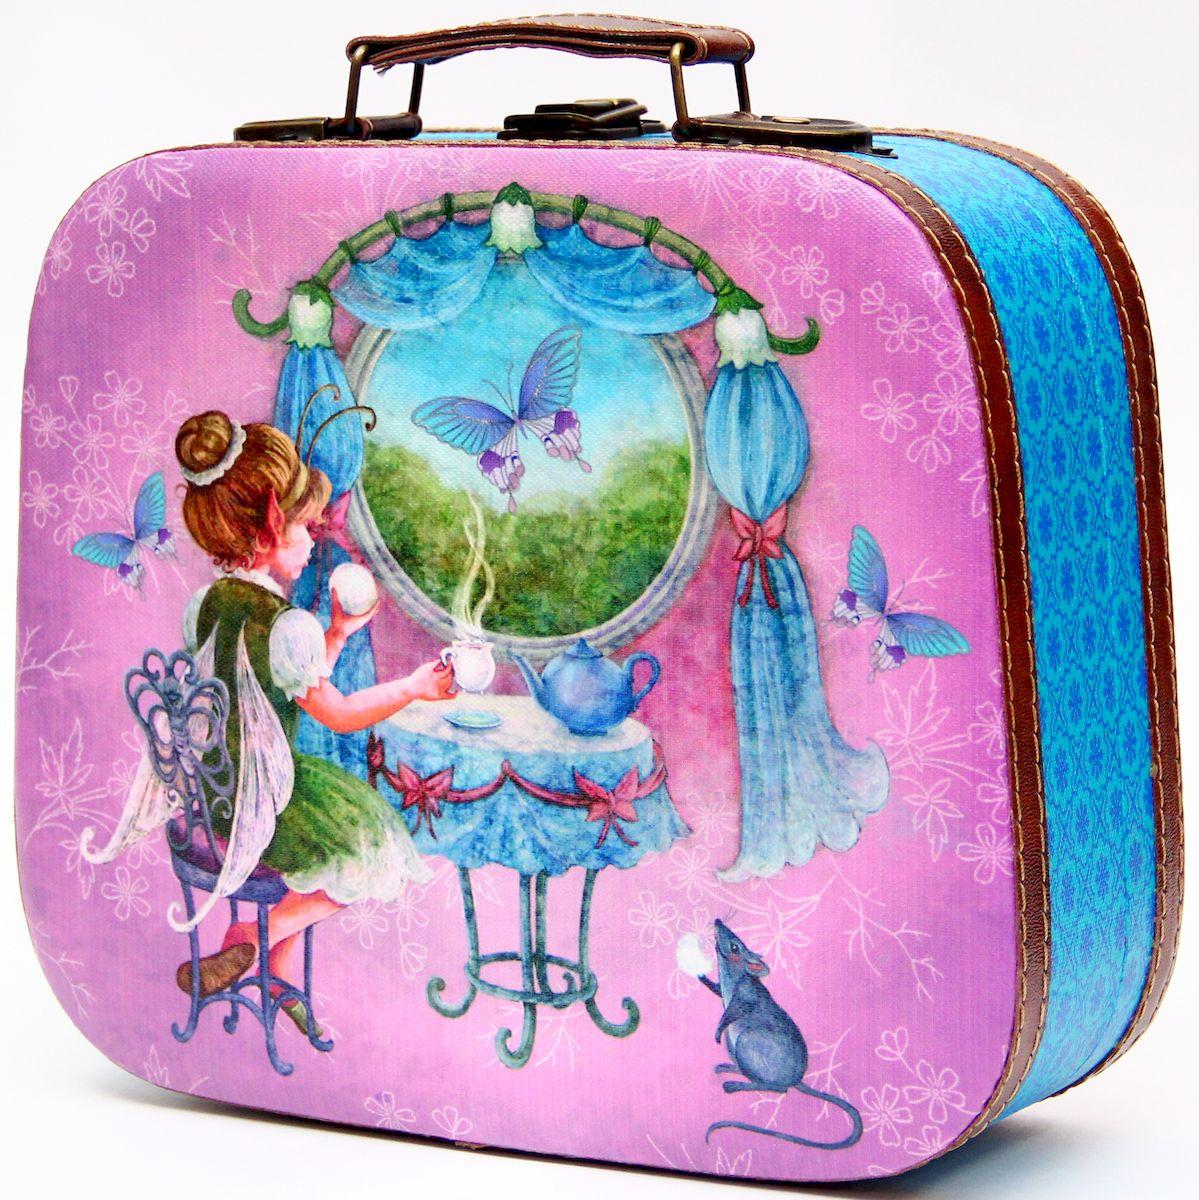 Шкатулка декоративная Magic Home Волшебное чаепитие, цвет: синий, сиреневый, 25 х 20,5 х 9 см шкатулки magic home шкатулка дождь в париже